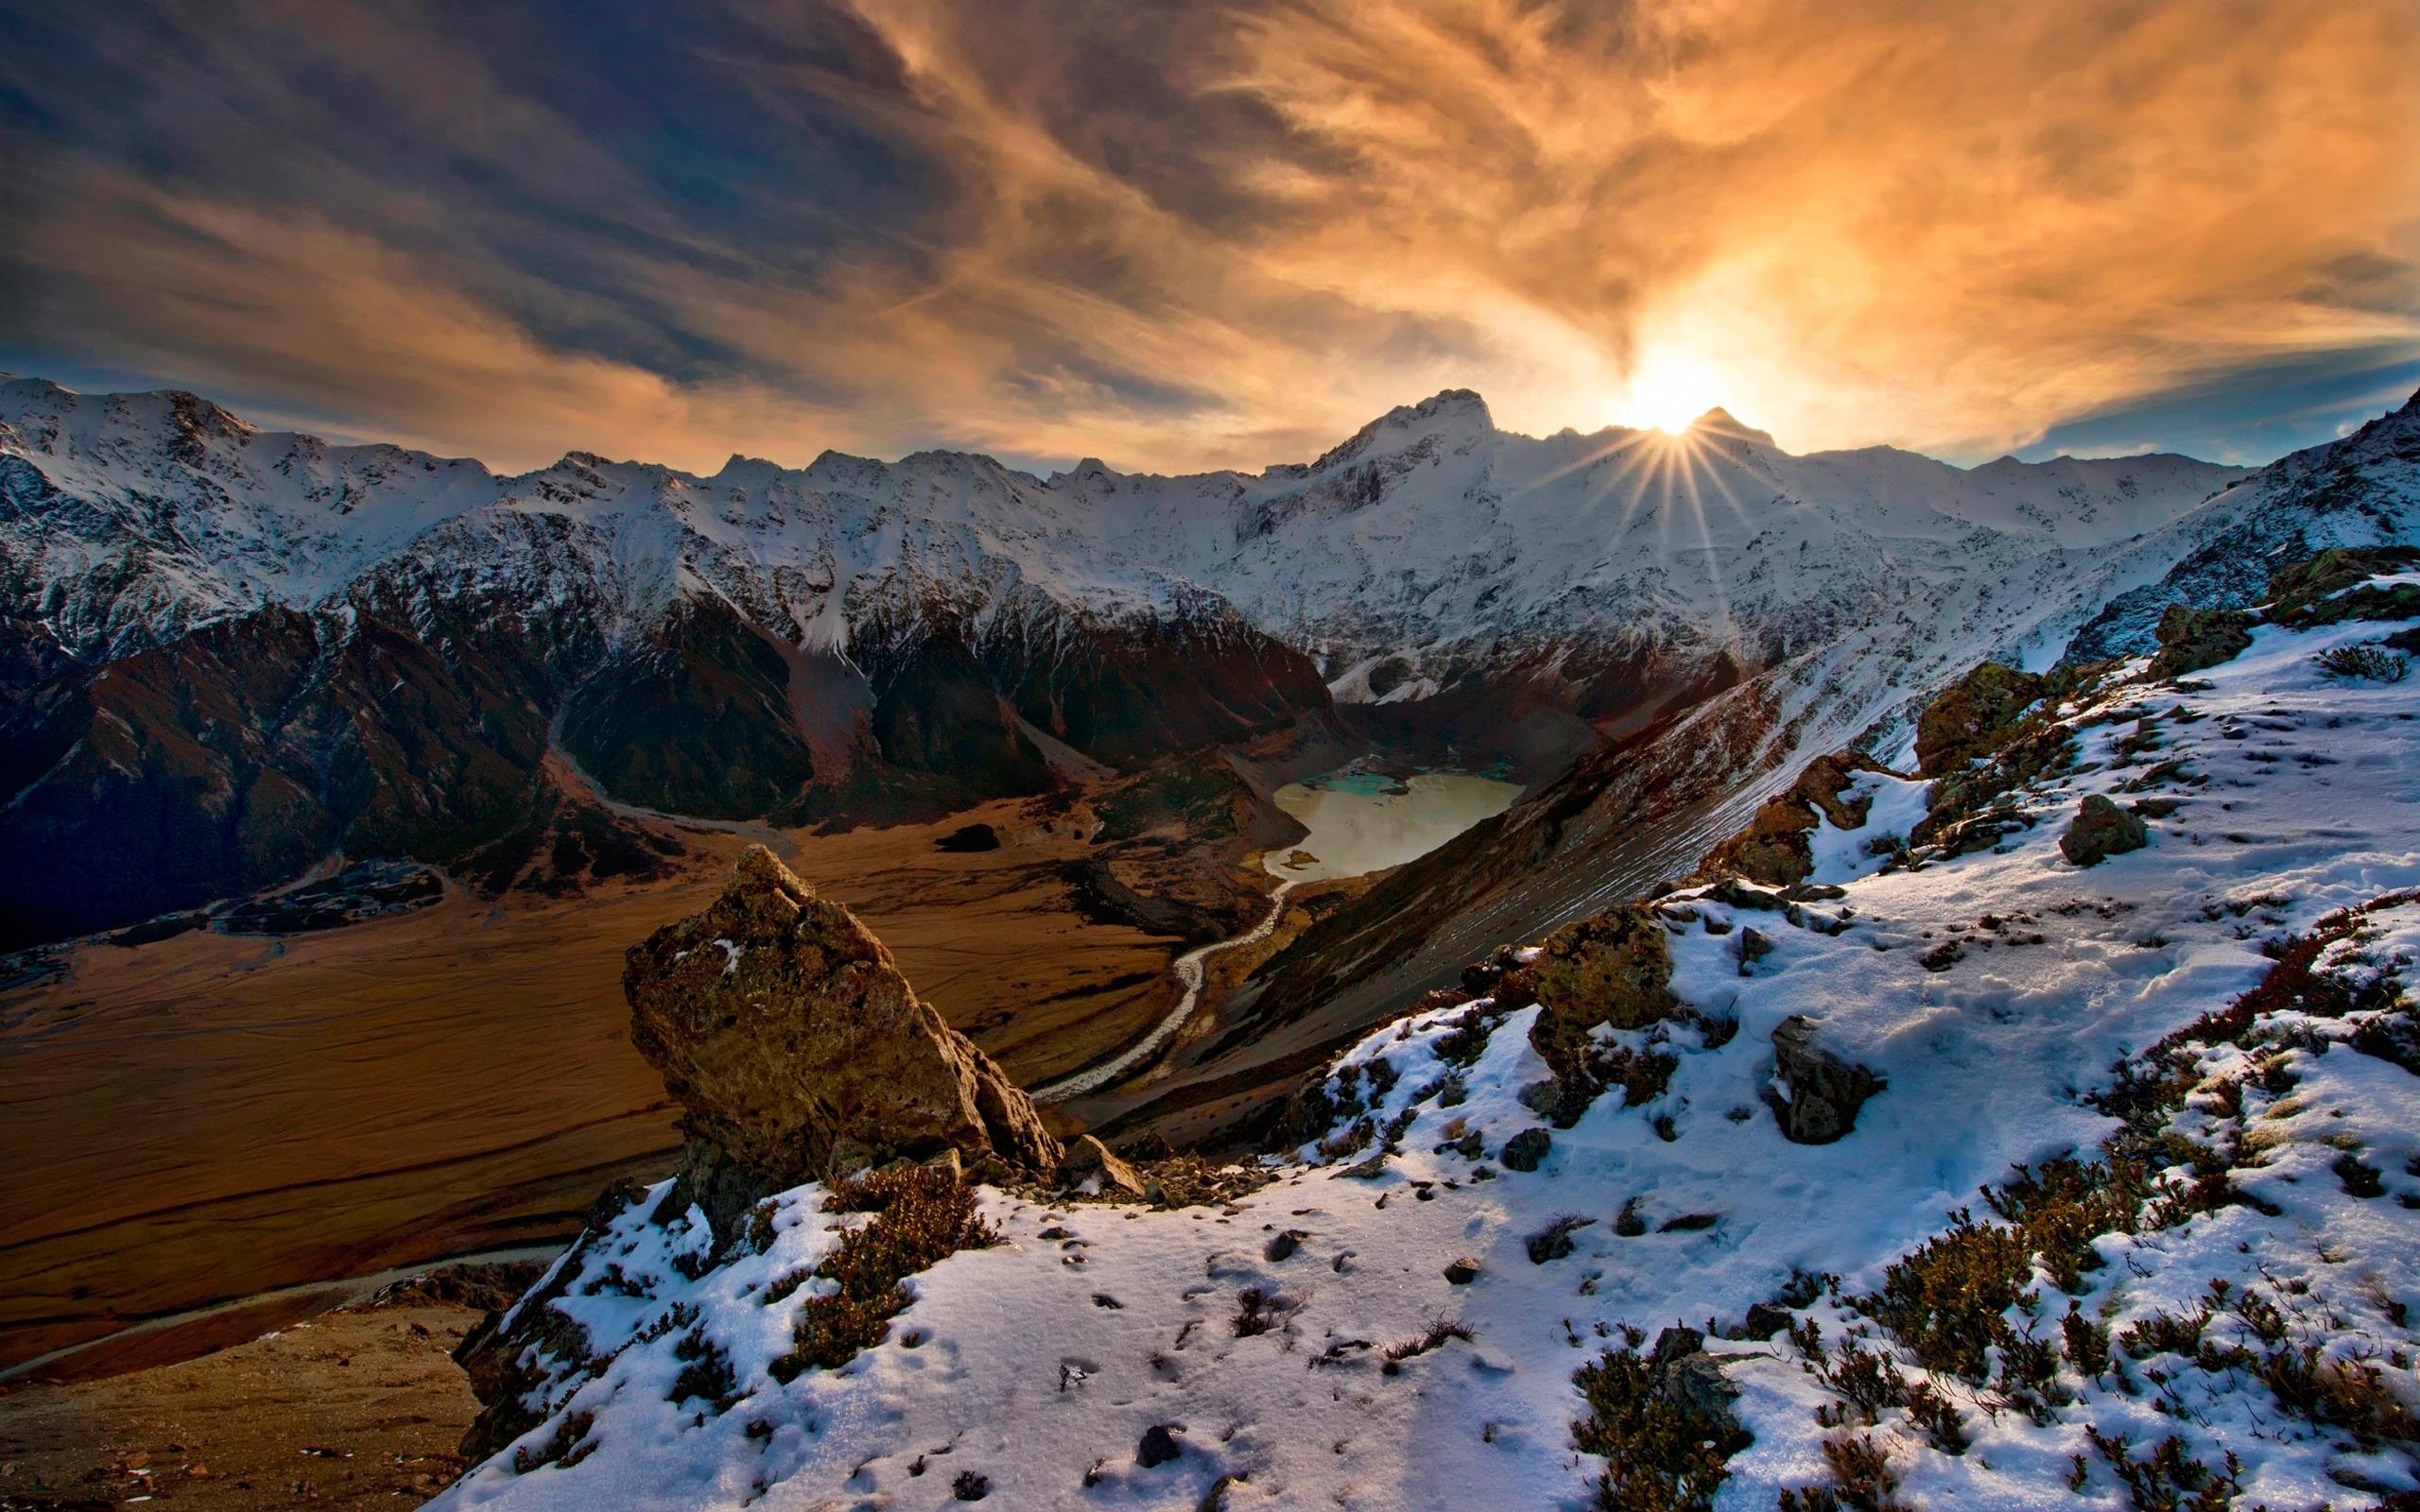 16 Luxury Pubg Wallpaper Iphone 6: 壁紙 山、雪、日の出 2560x1600 HD 無料のデスクトップの背景, 画像